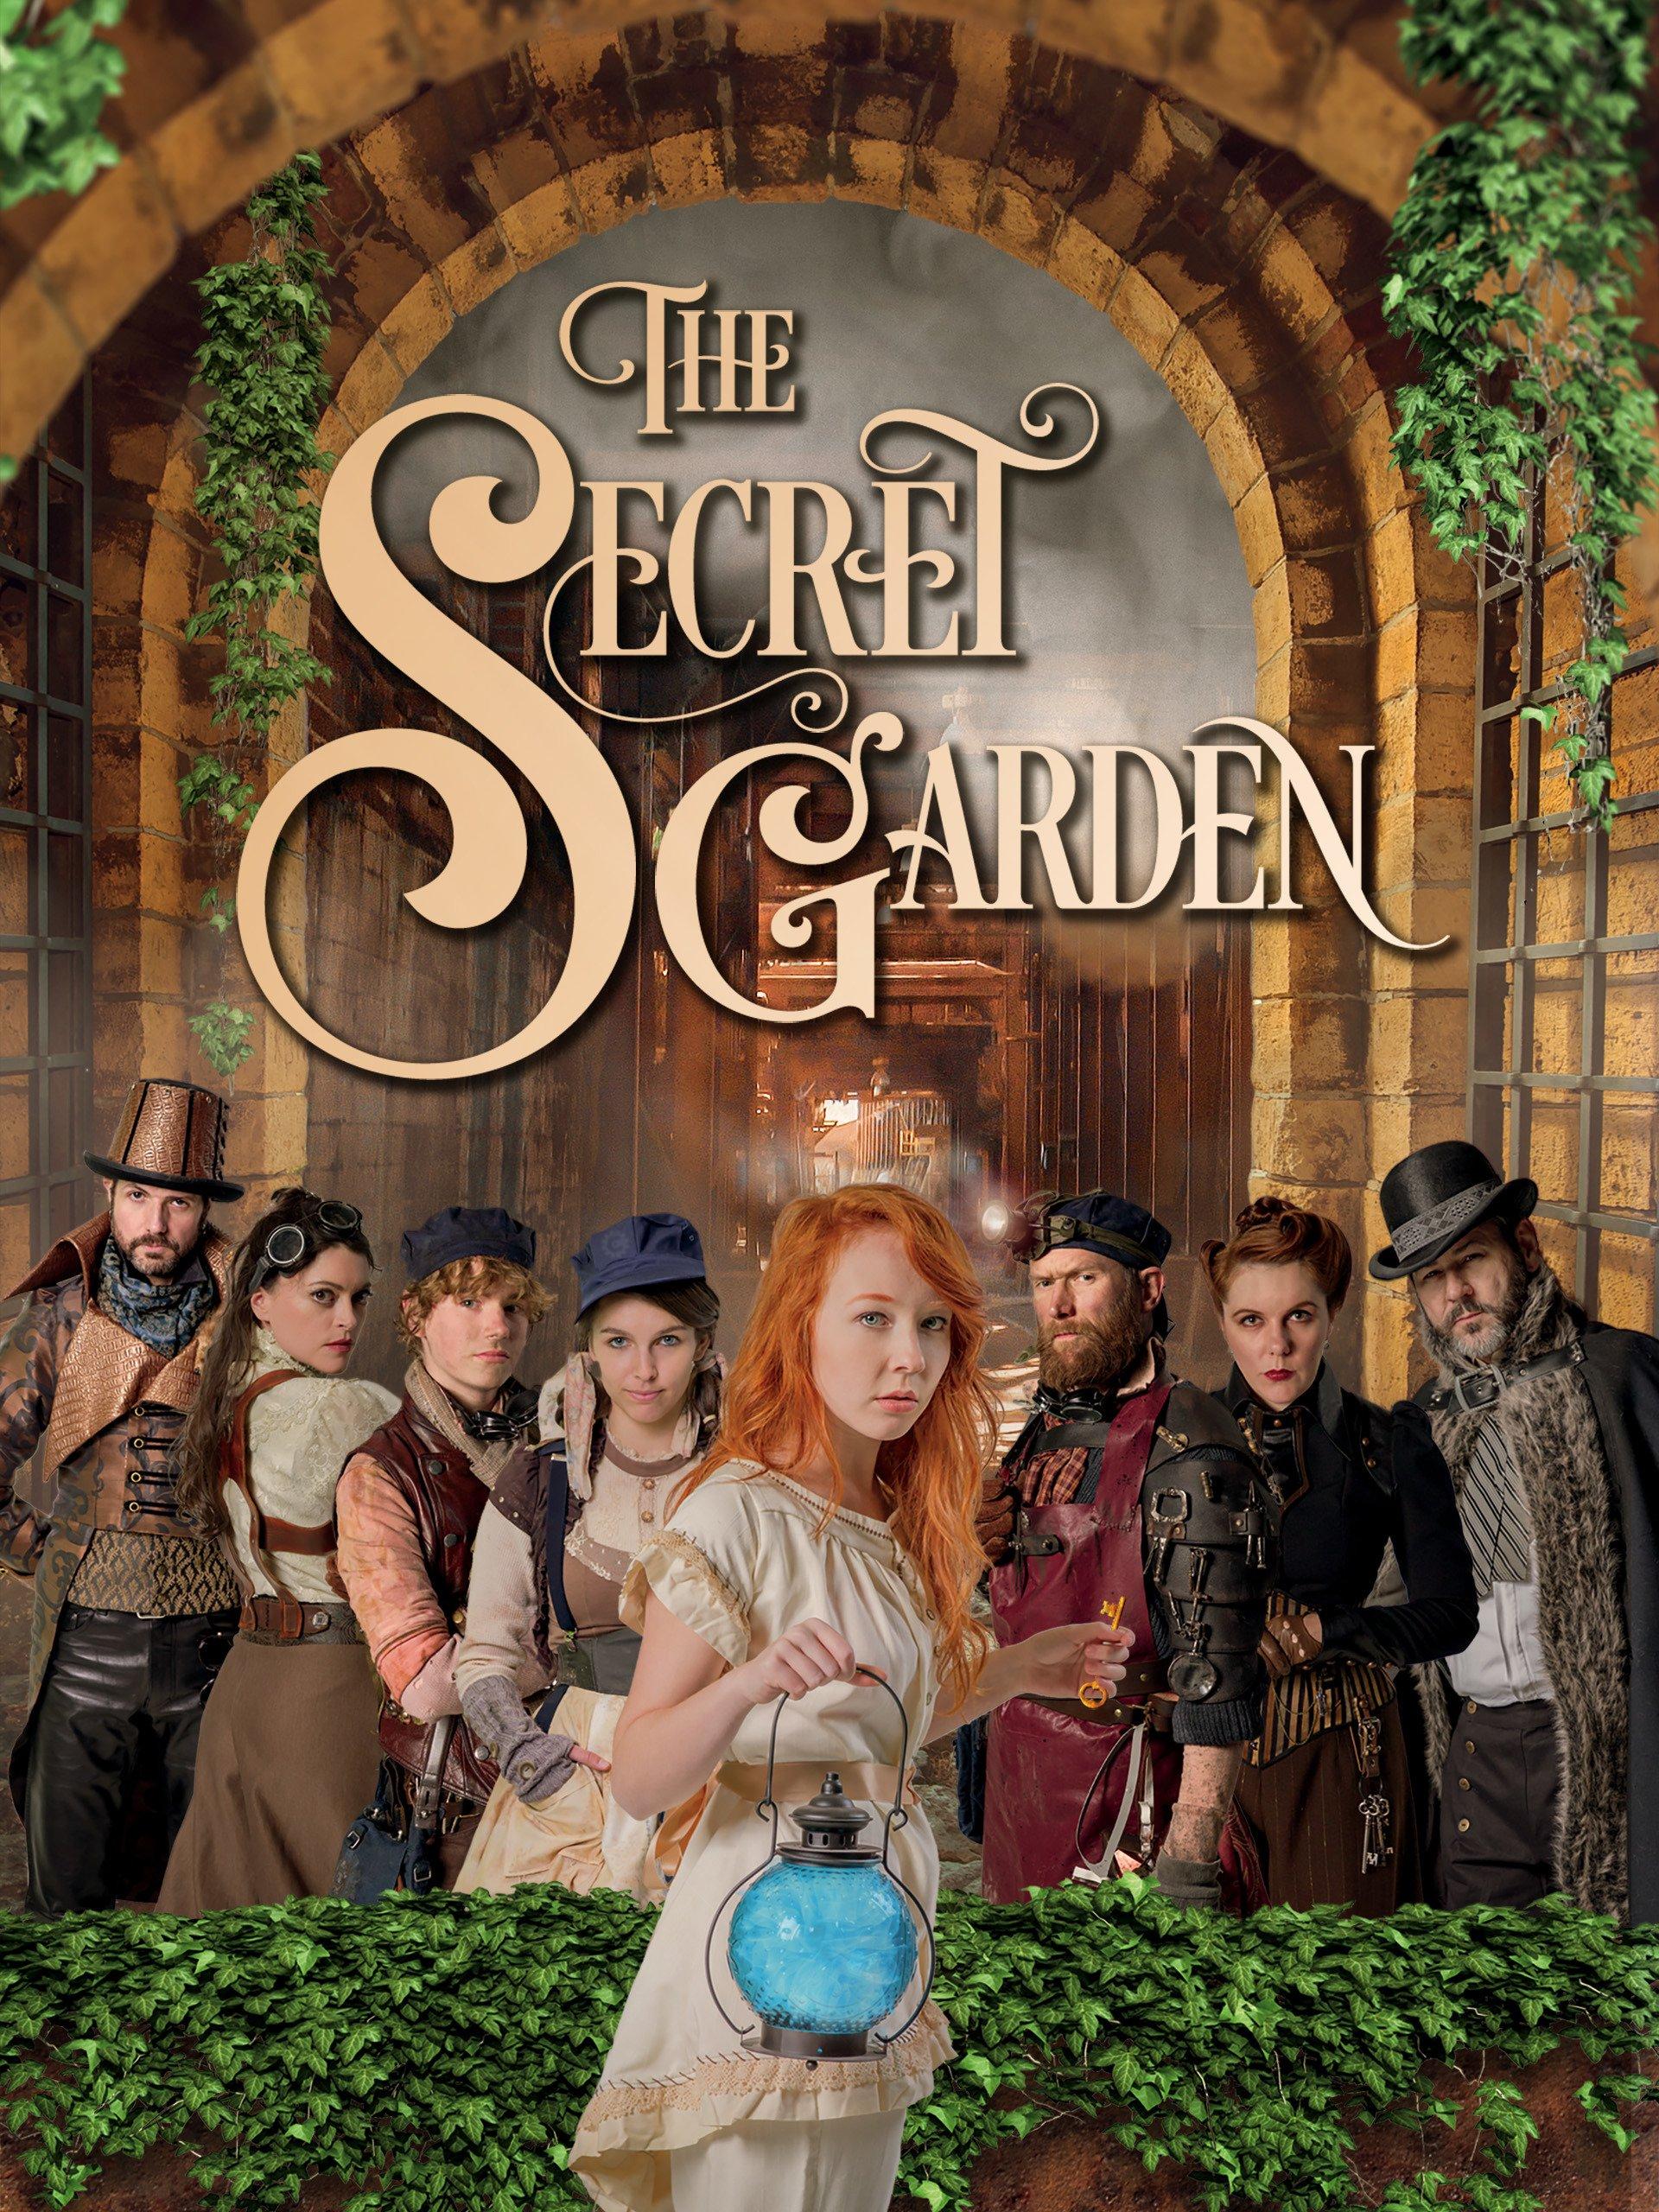 Amazon.co.uk: Watch The Secret Garden | Prime Video